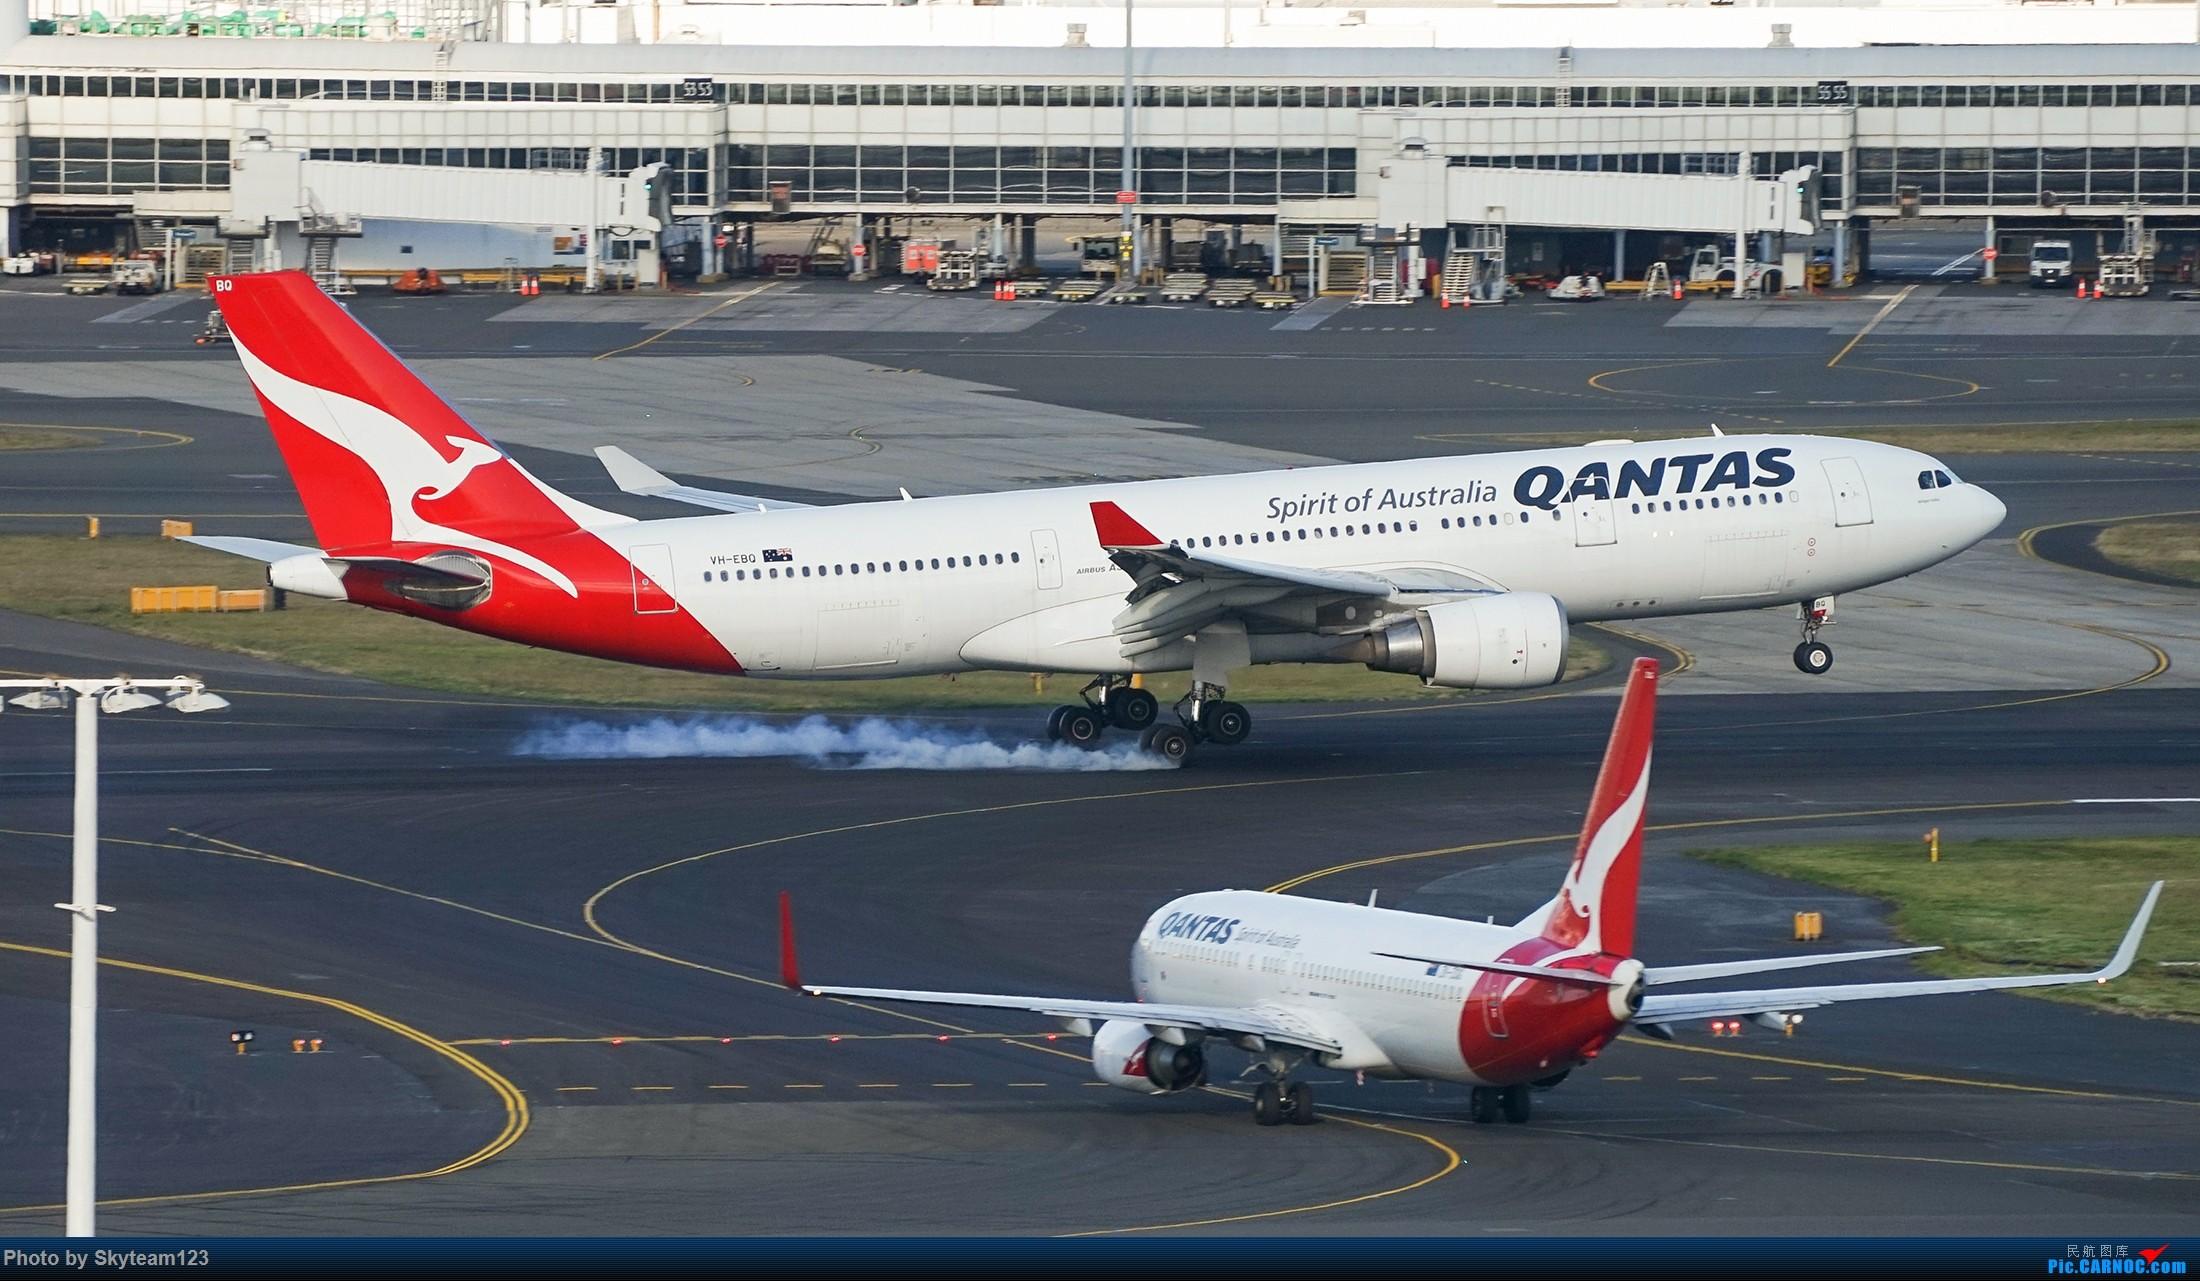 Re:[原创][SYD] 假期拍机小结 解锁16R跑道头拍机位 & 停车楼拍机作业 【全宽体】 AIRBUS A330-200 VH-EBQ 澳大利亚悉尼金斯福德·史密斯机场